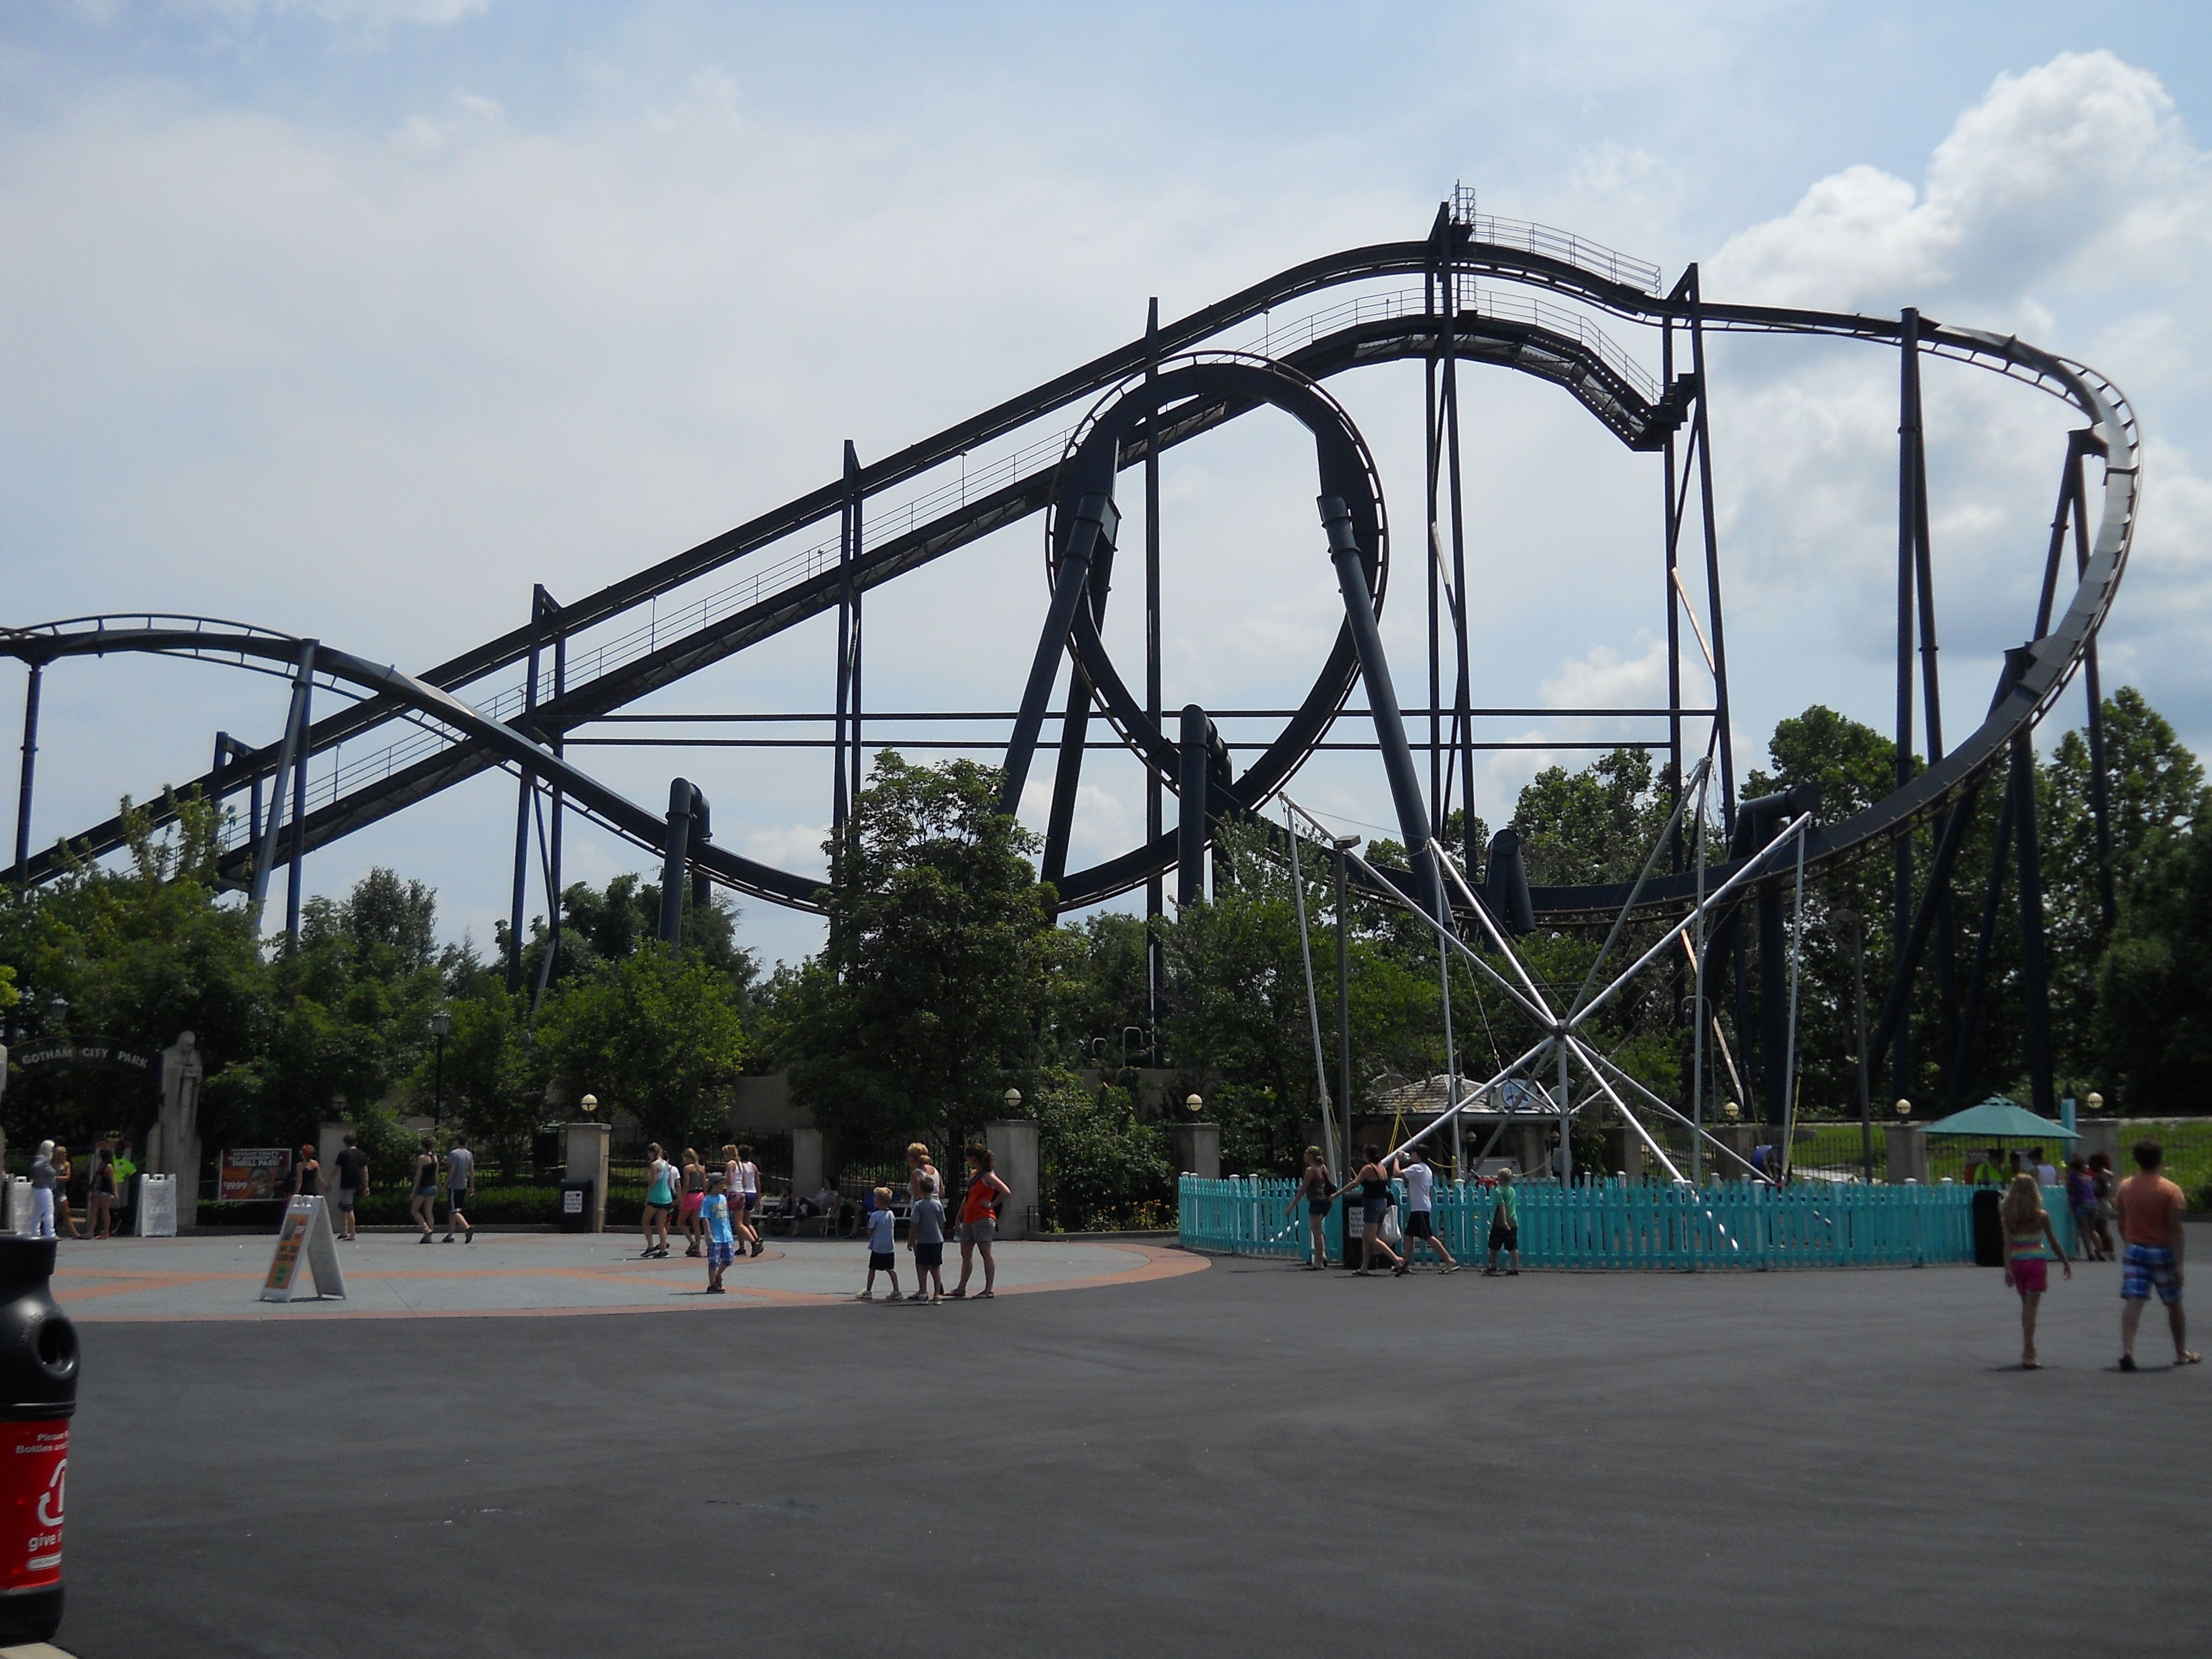 Batman Six Flags St Louis Mo Inverted Looping Steel Coaster St Louis Missouri Scenery Theme Park